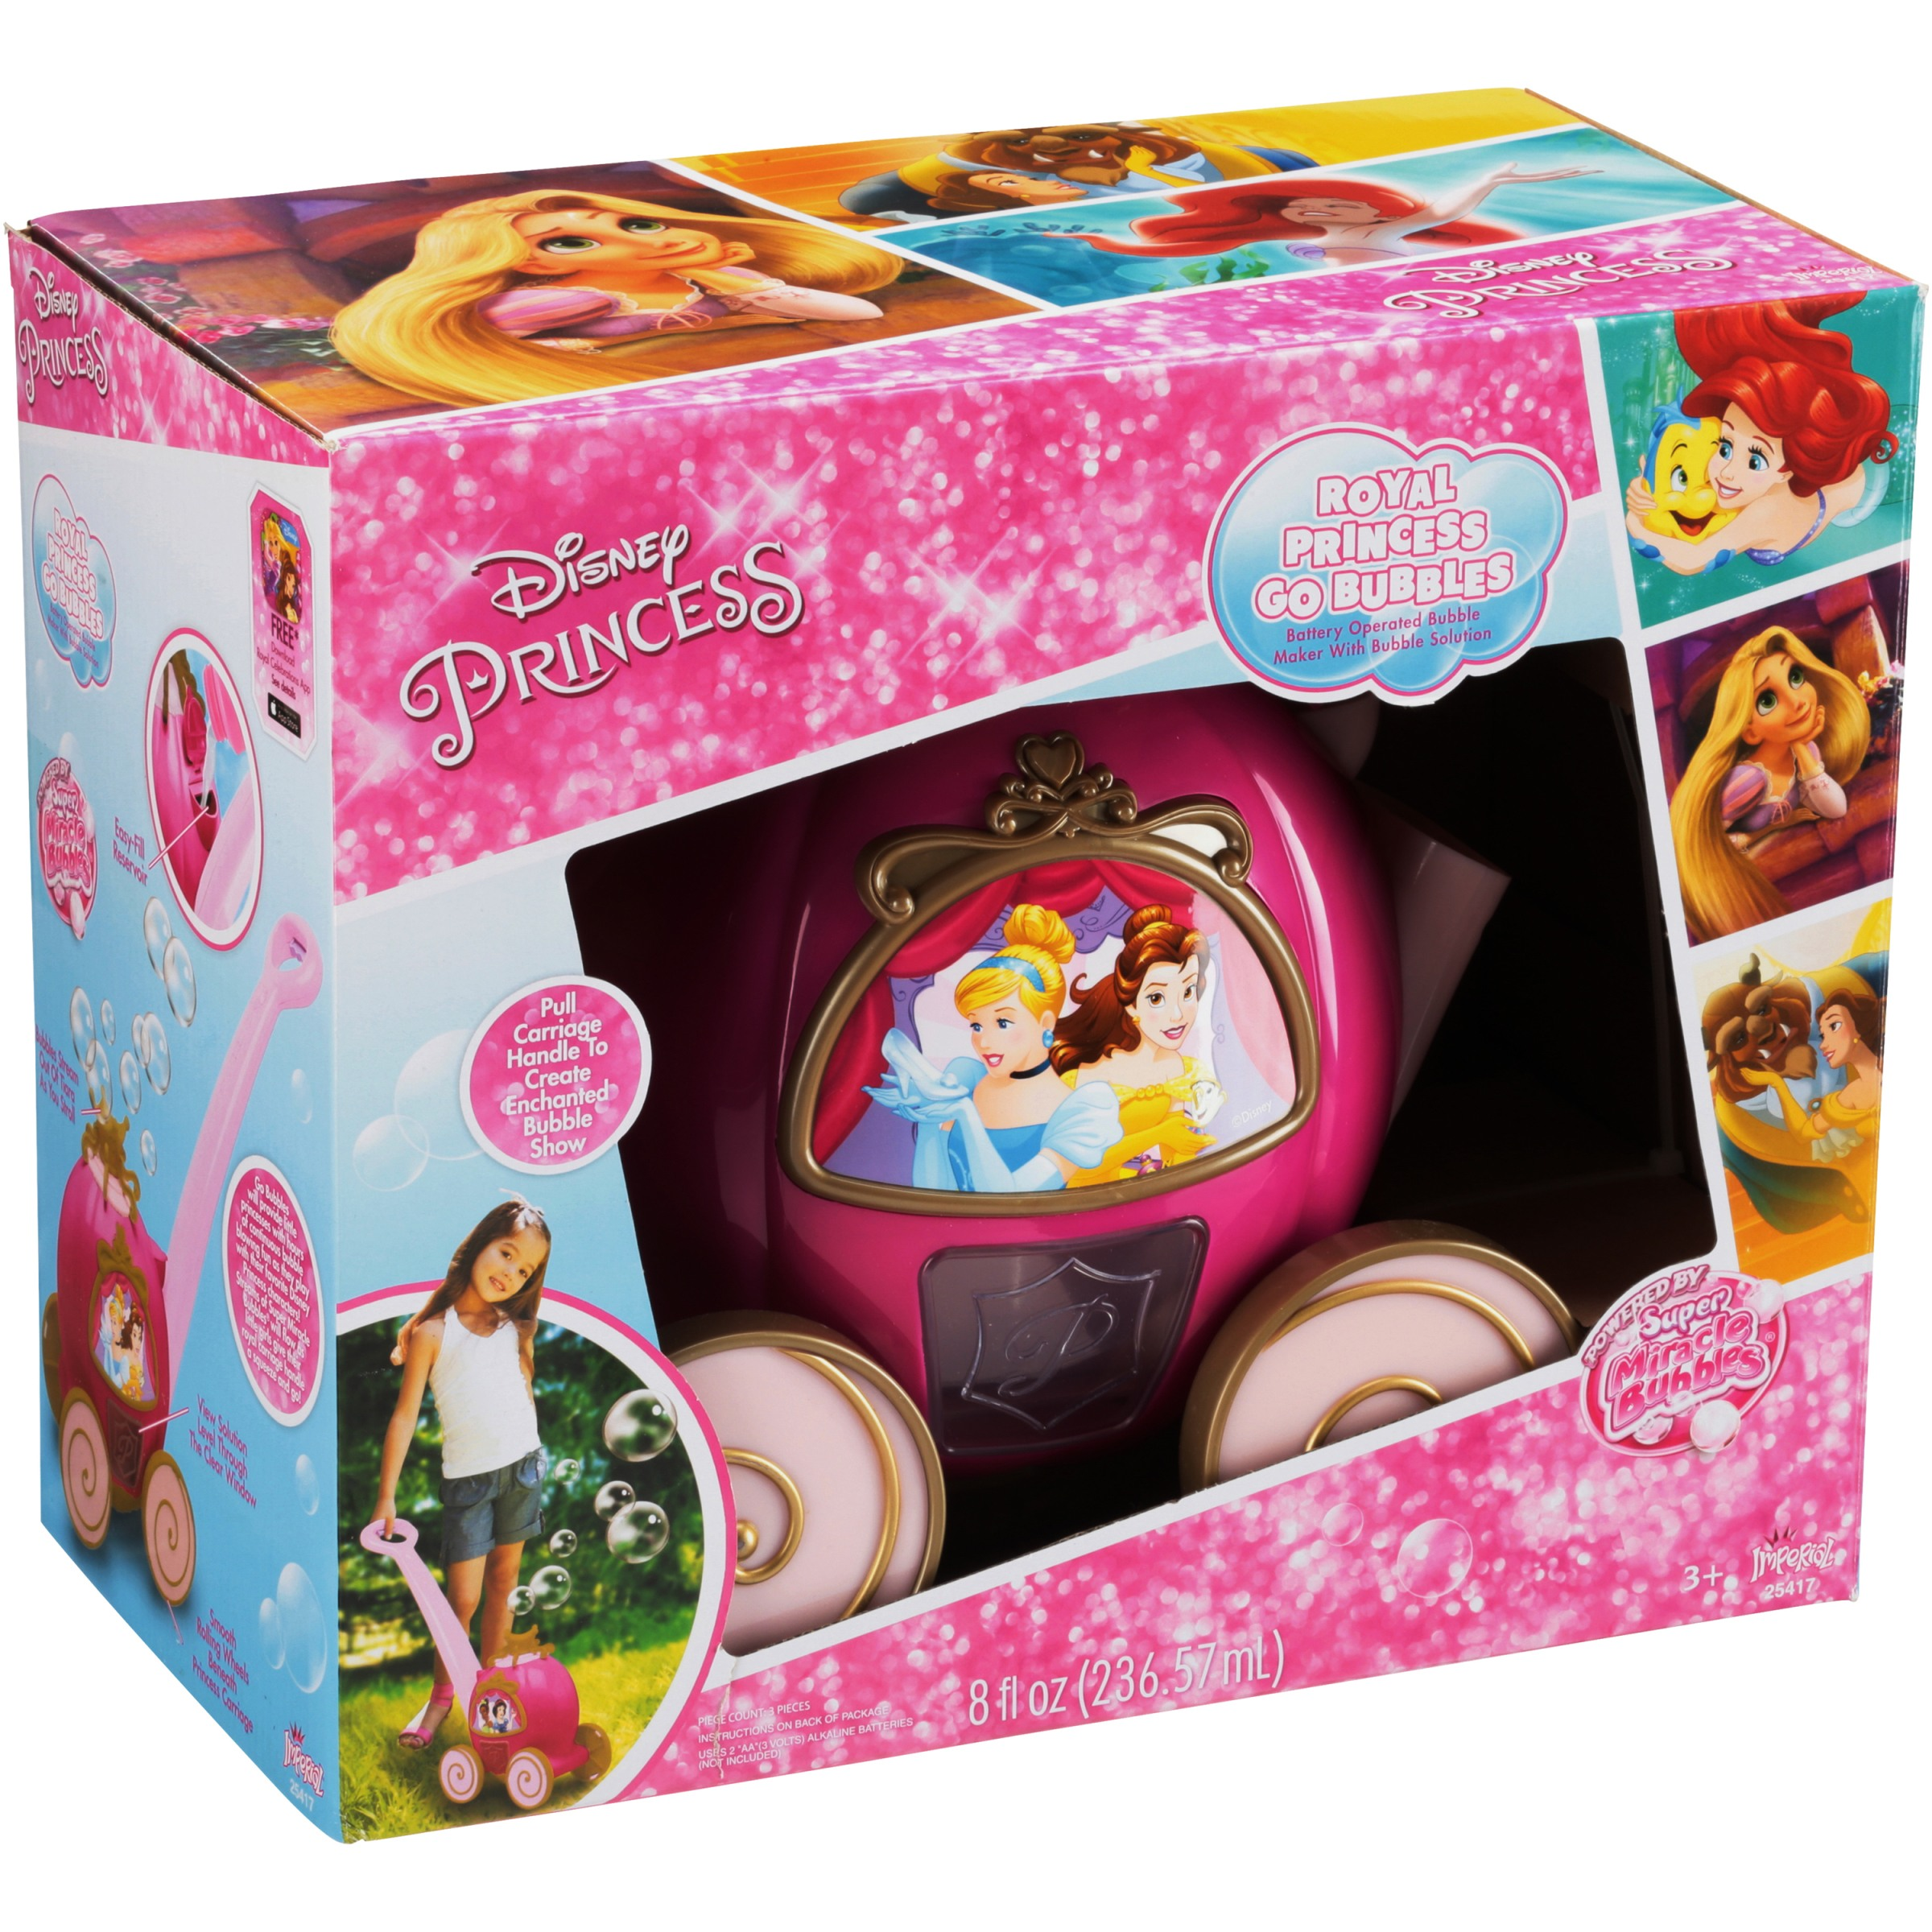 Imperial Toy Disney Princess Royal Go Bubbles